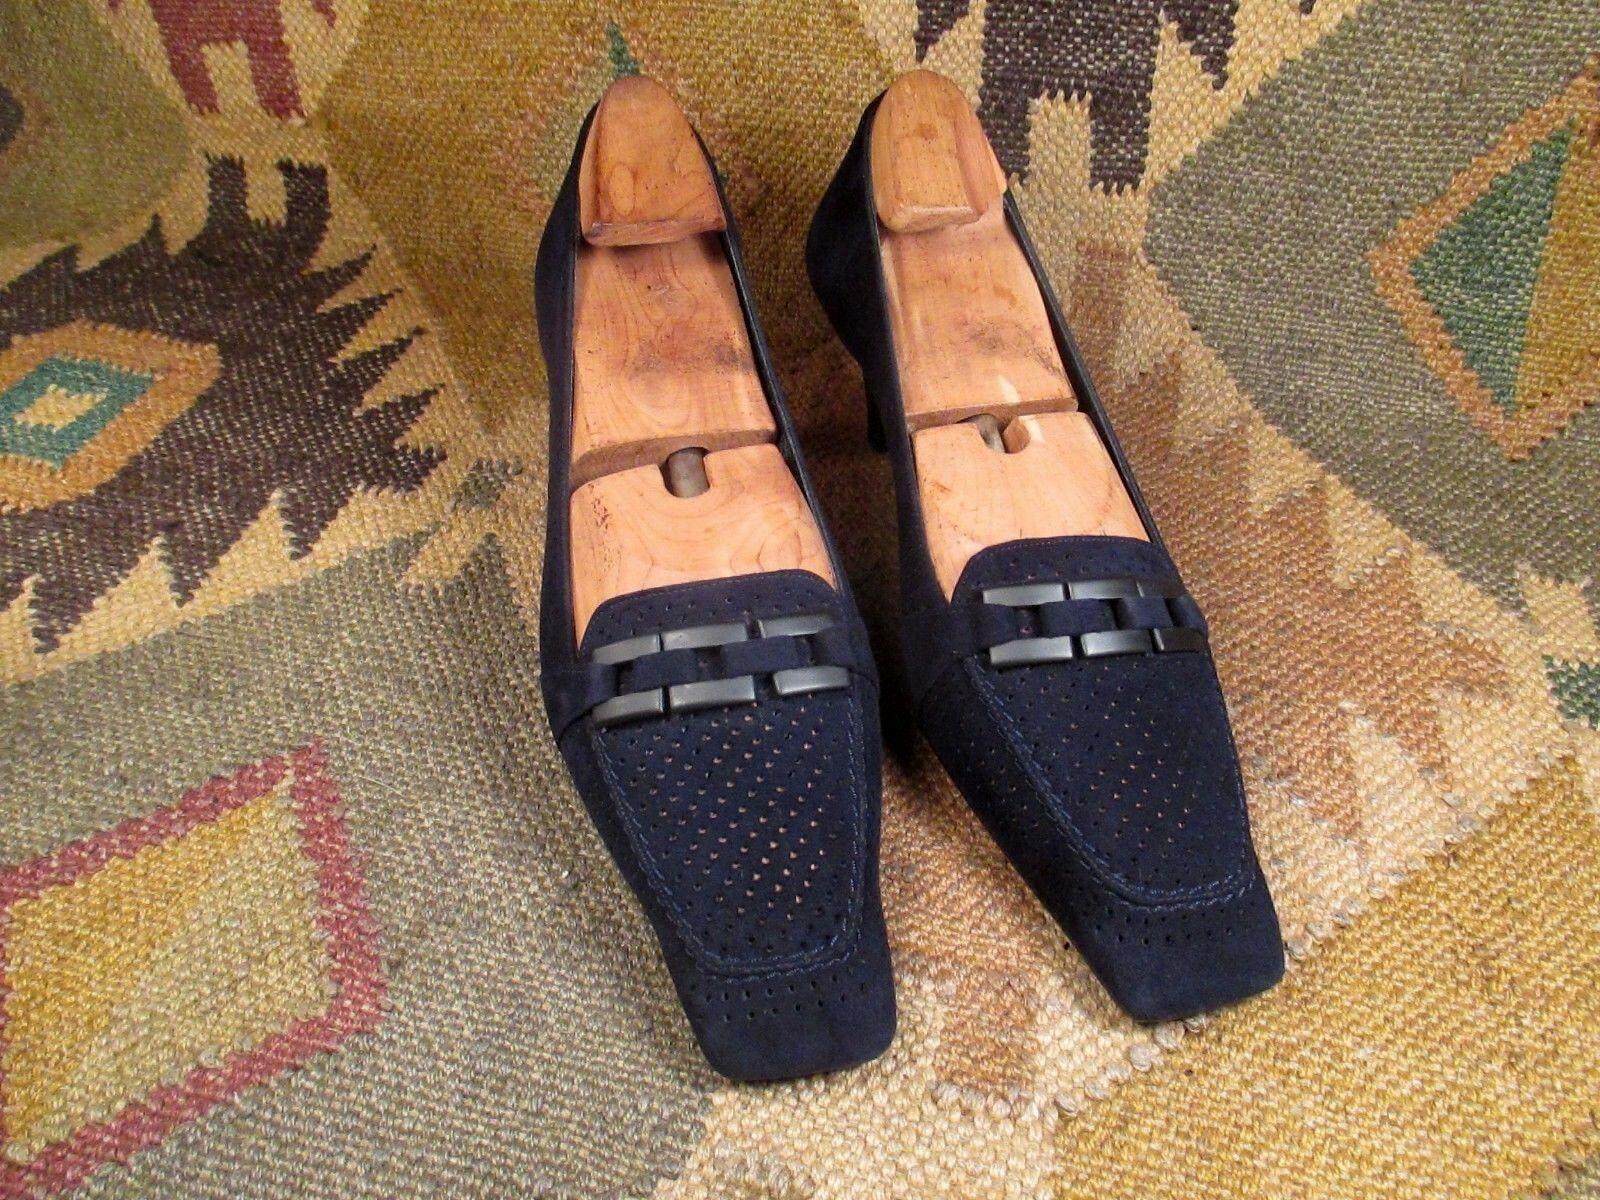 Stuart Weitzman bluee Suede Square Toe Classic  Kitten Heels Pumps shoes size 8 N